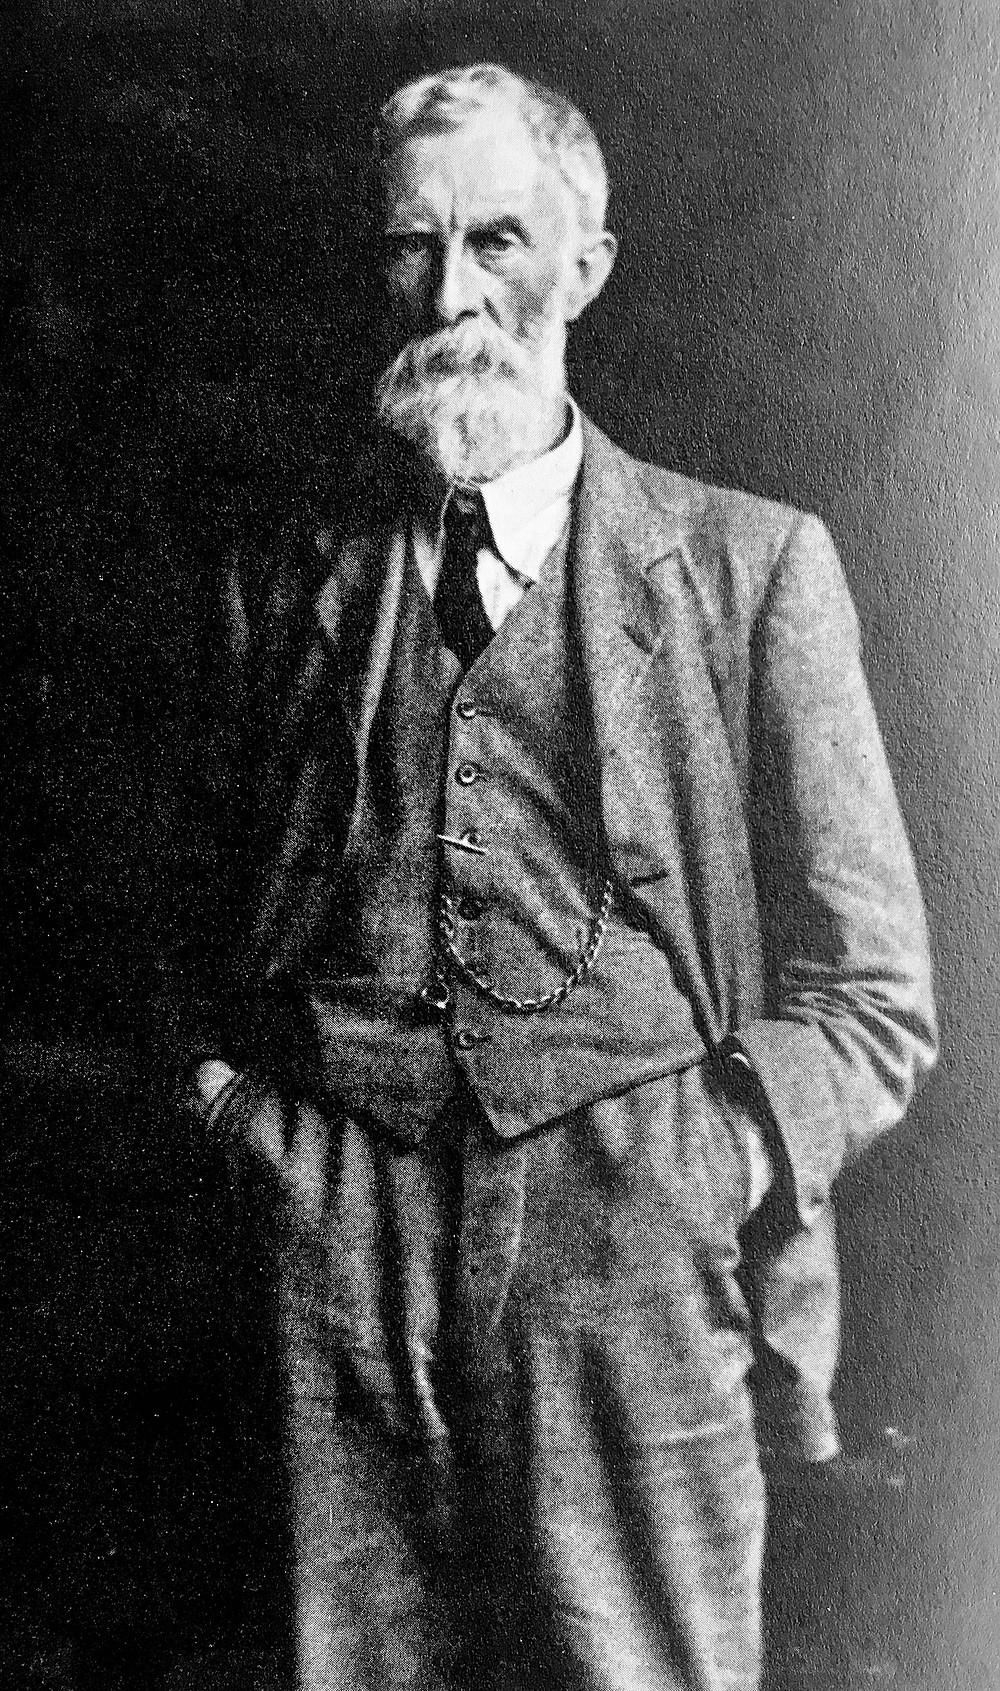 Frank Meadow Sutcliffe, self portrait